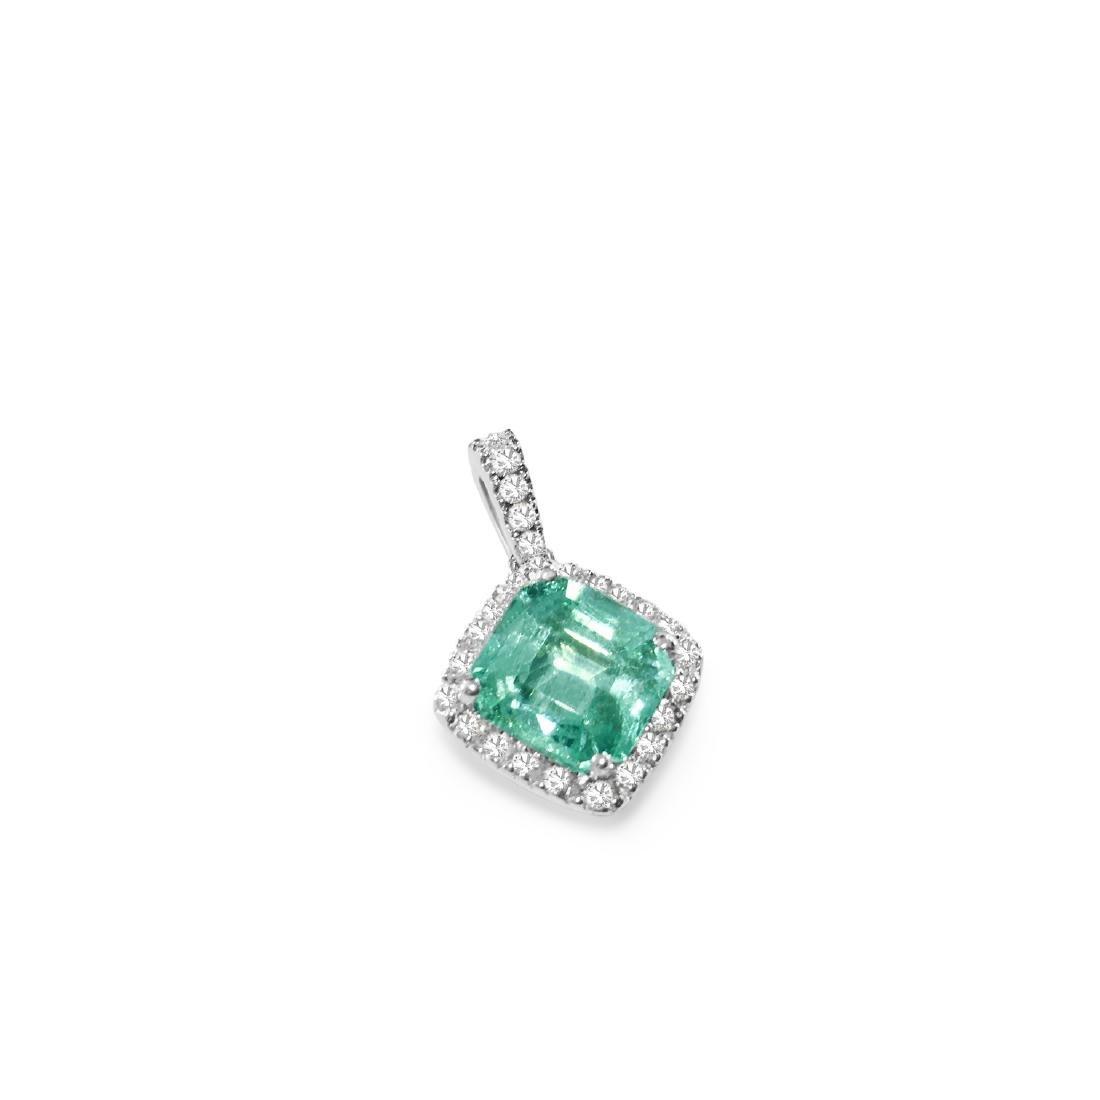 14k Gold, 4.00 Carat Emerald & Diamond Pendant. $12,000 - 2